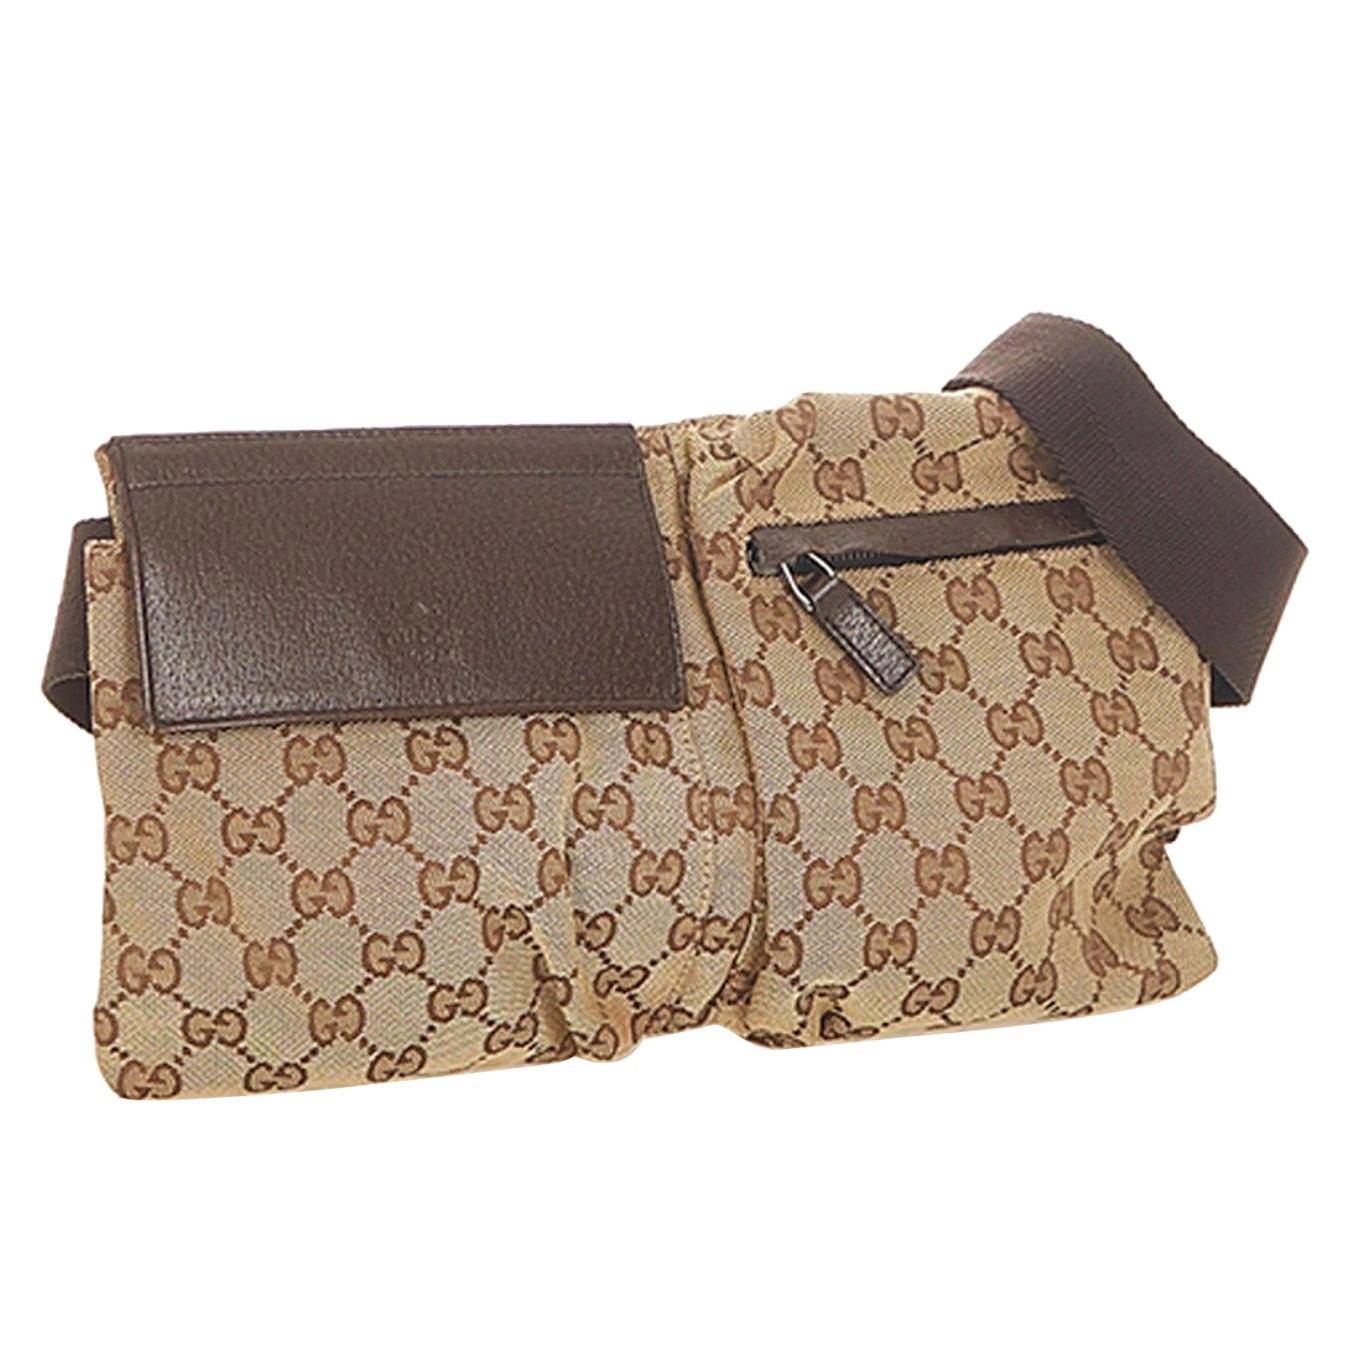 Gucci Belt Monogram Web Double Pocket Brown GG Supreme Canvas Cross Body Bag